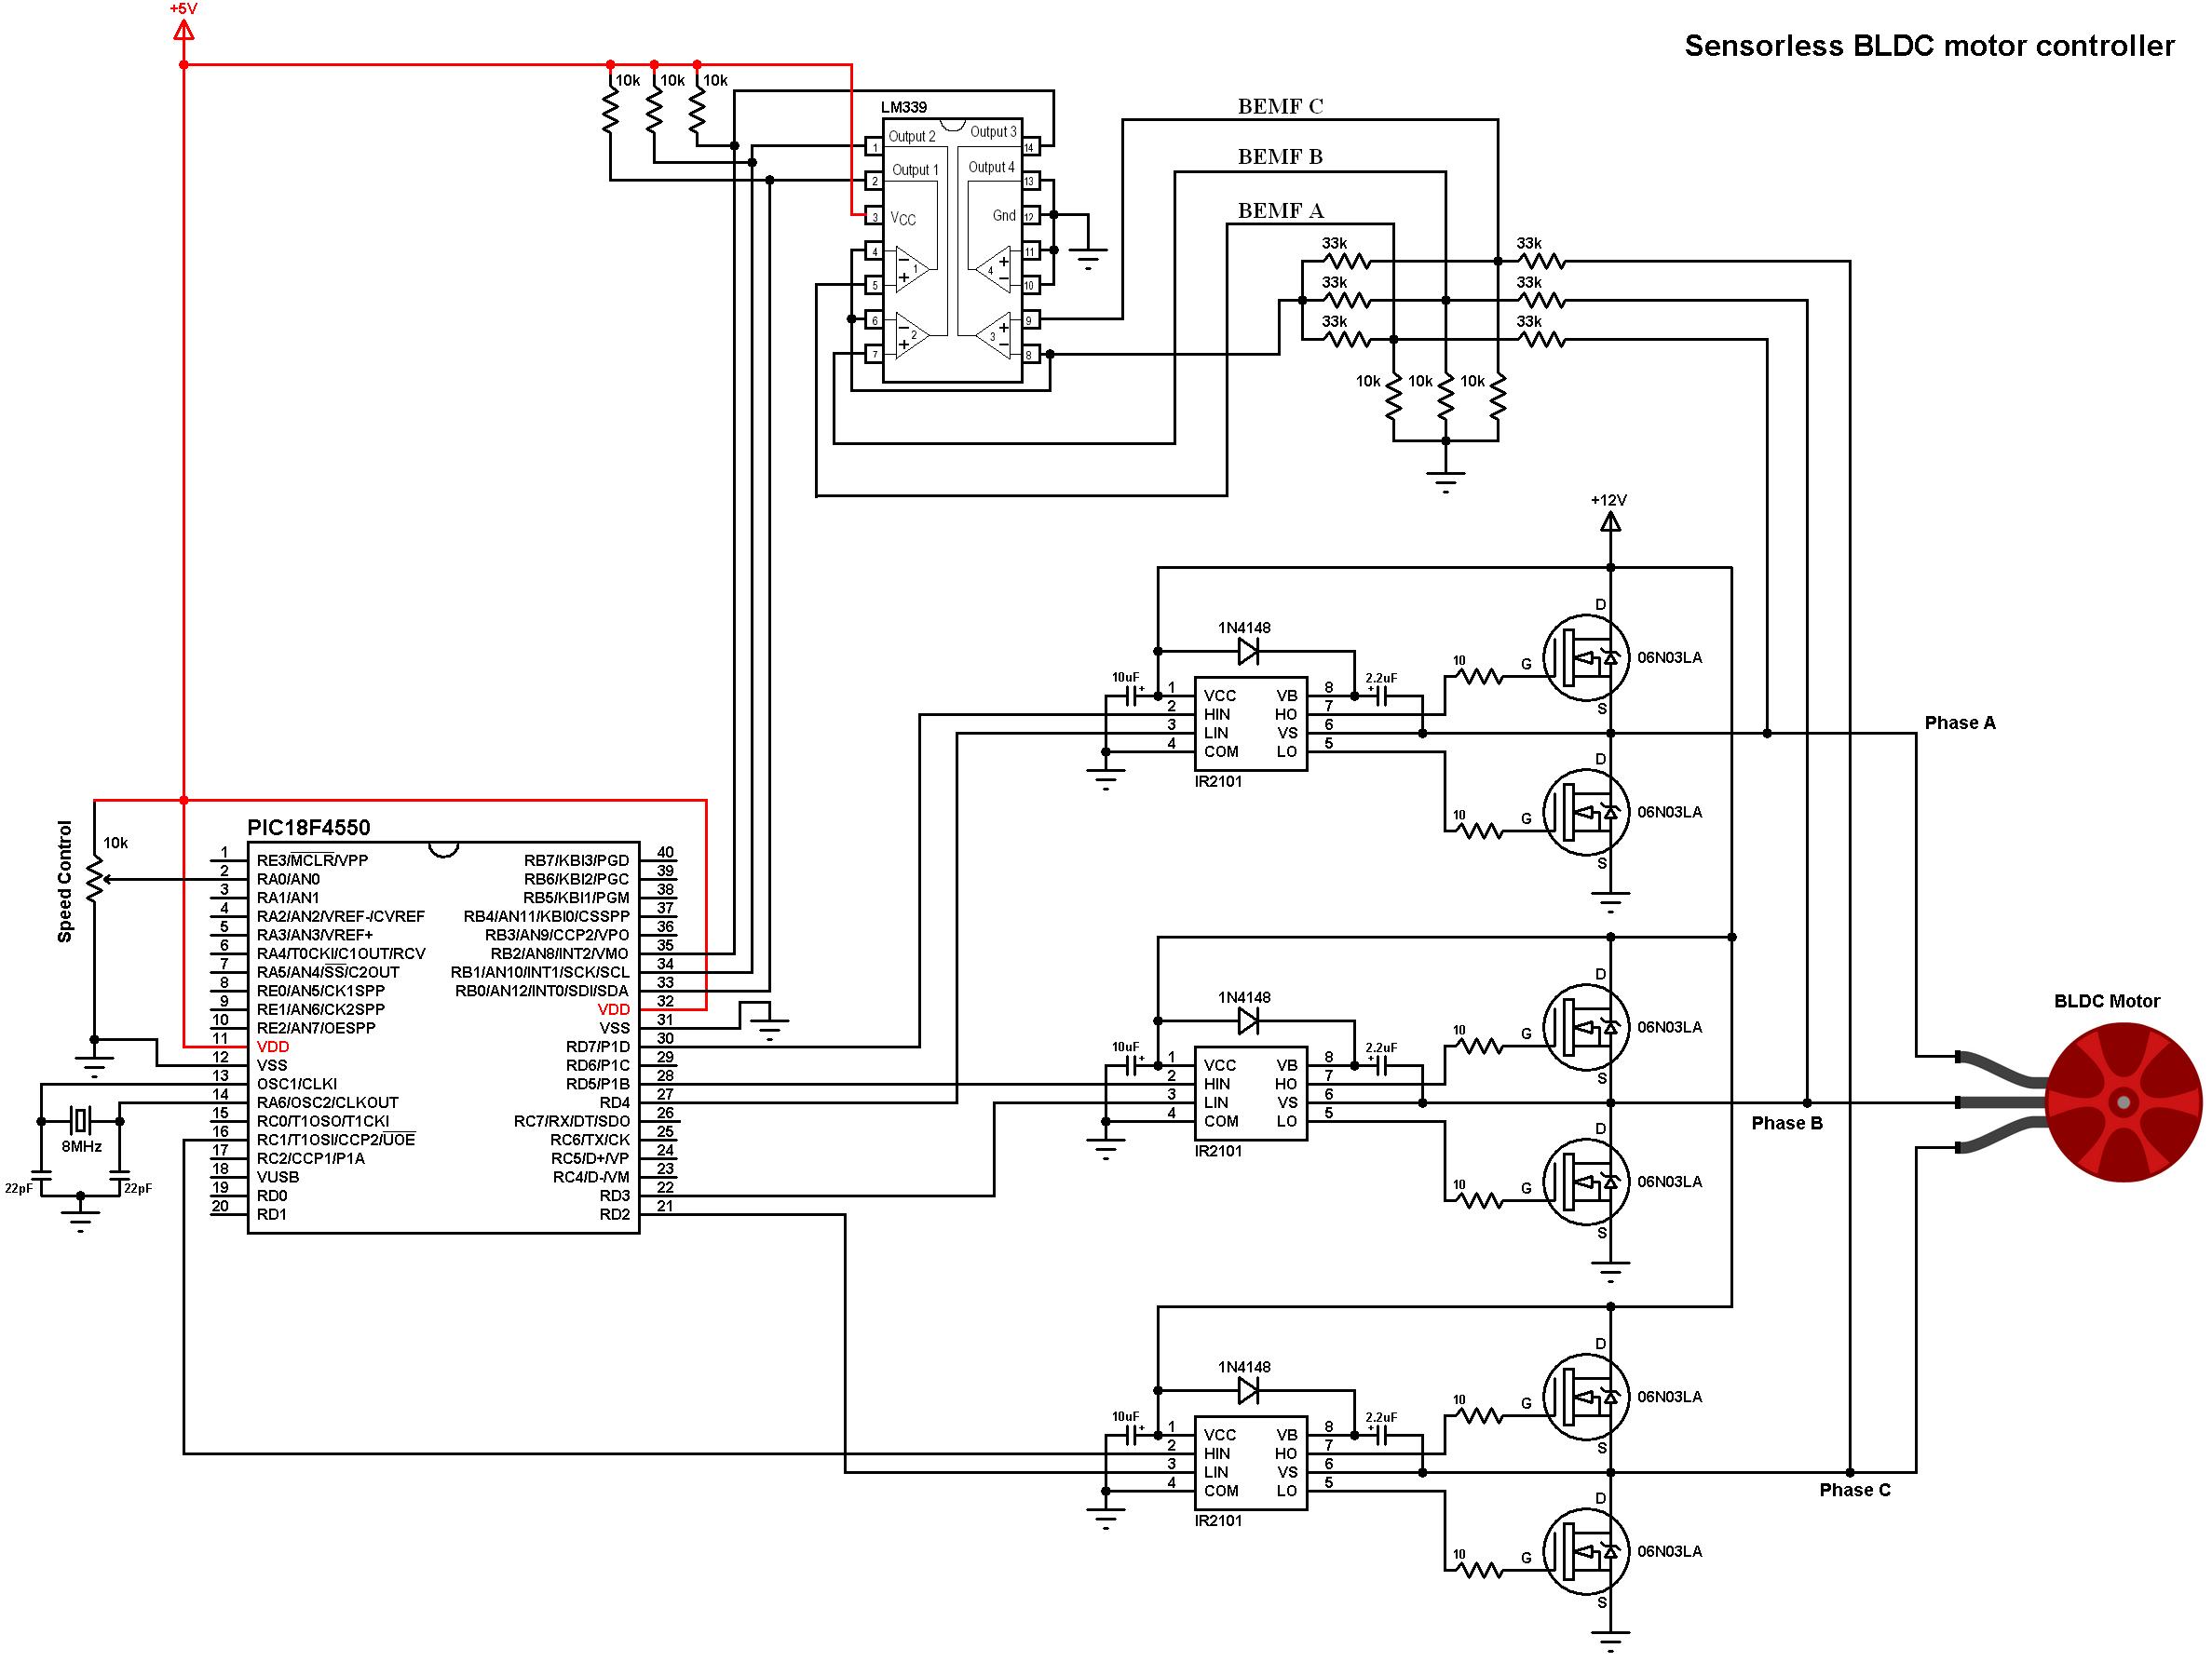 Brushless Esc Circuit Diagram 12f675 Based Brushed Motor